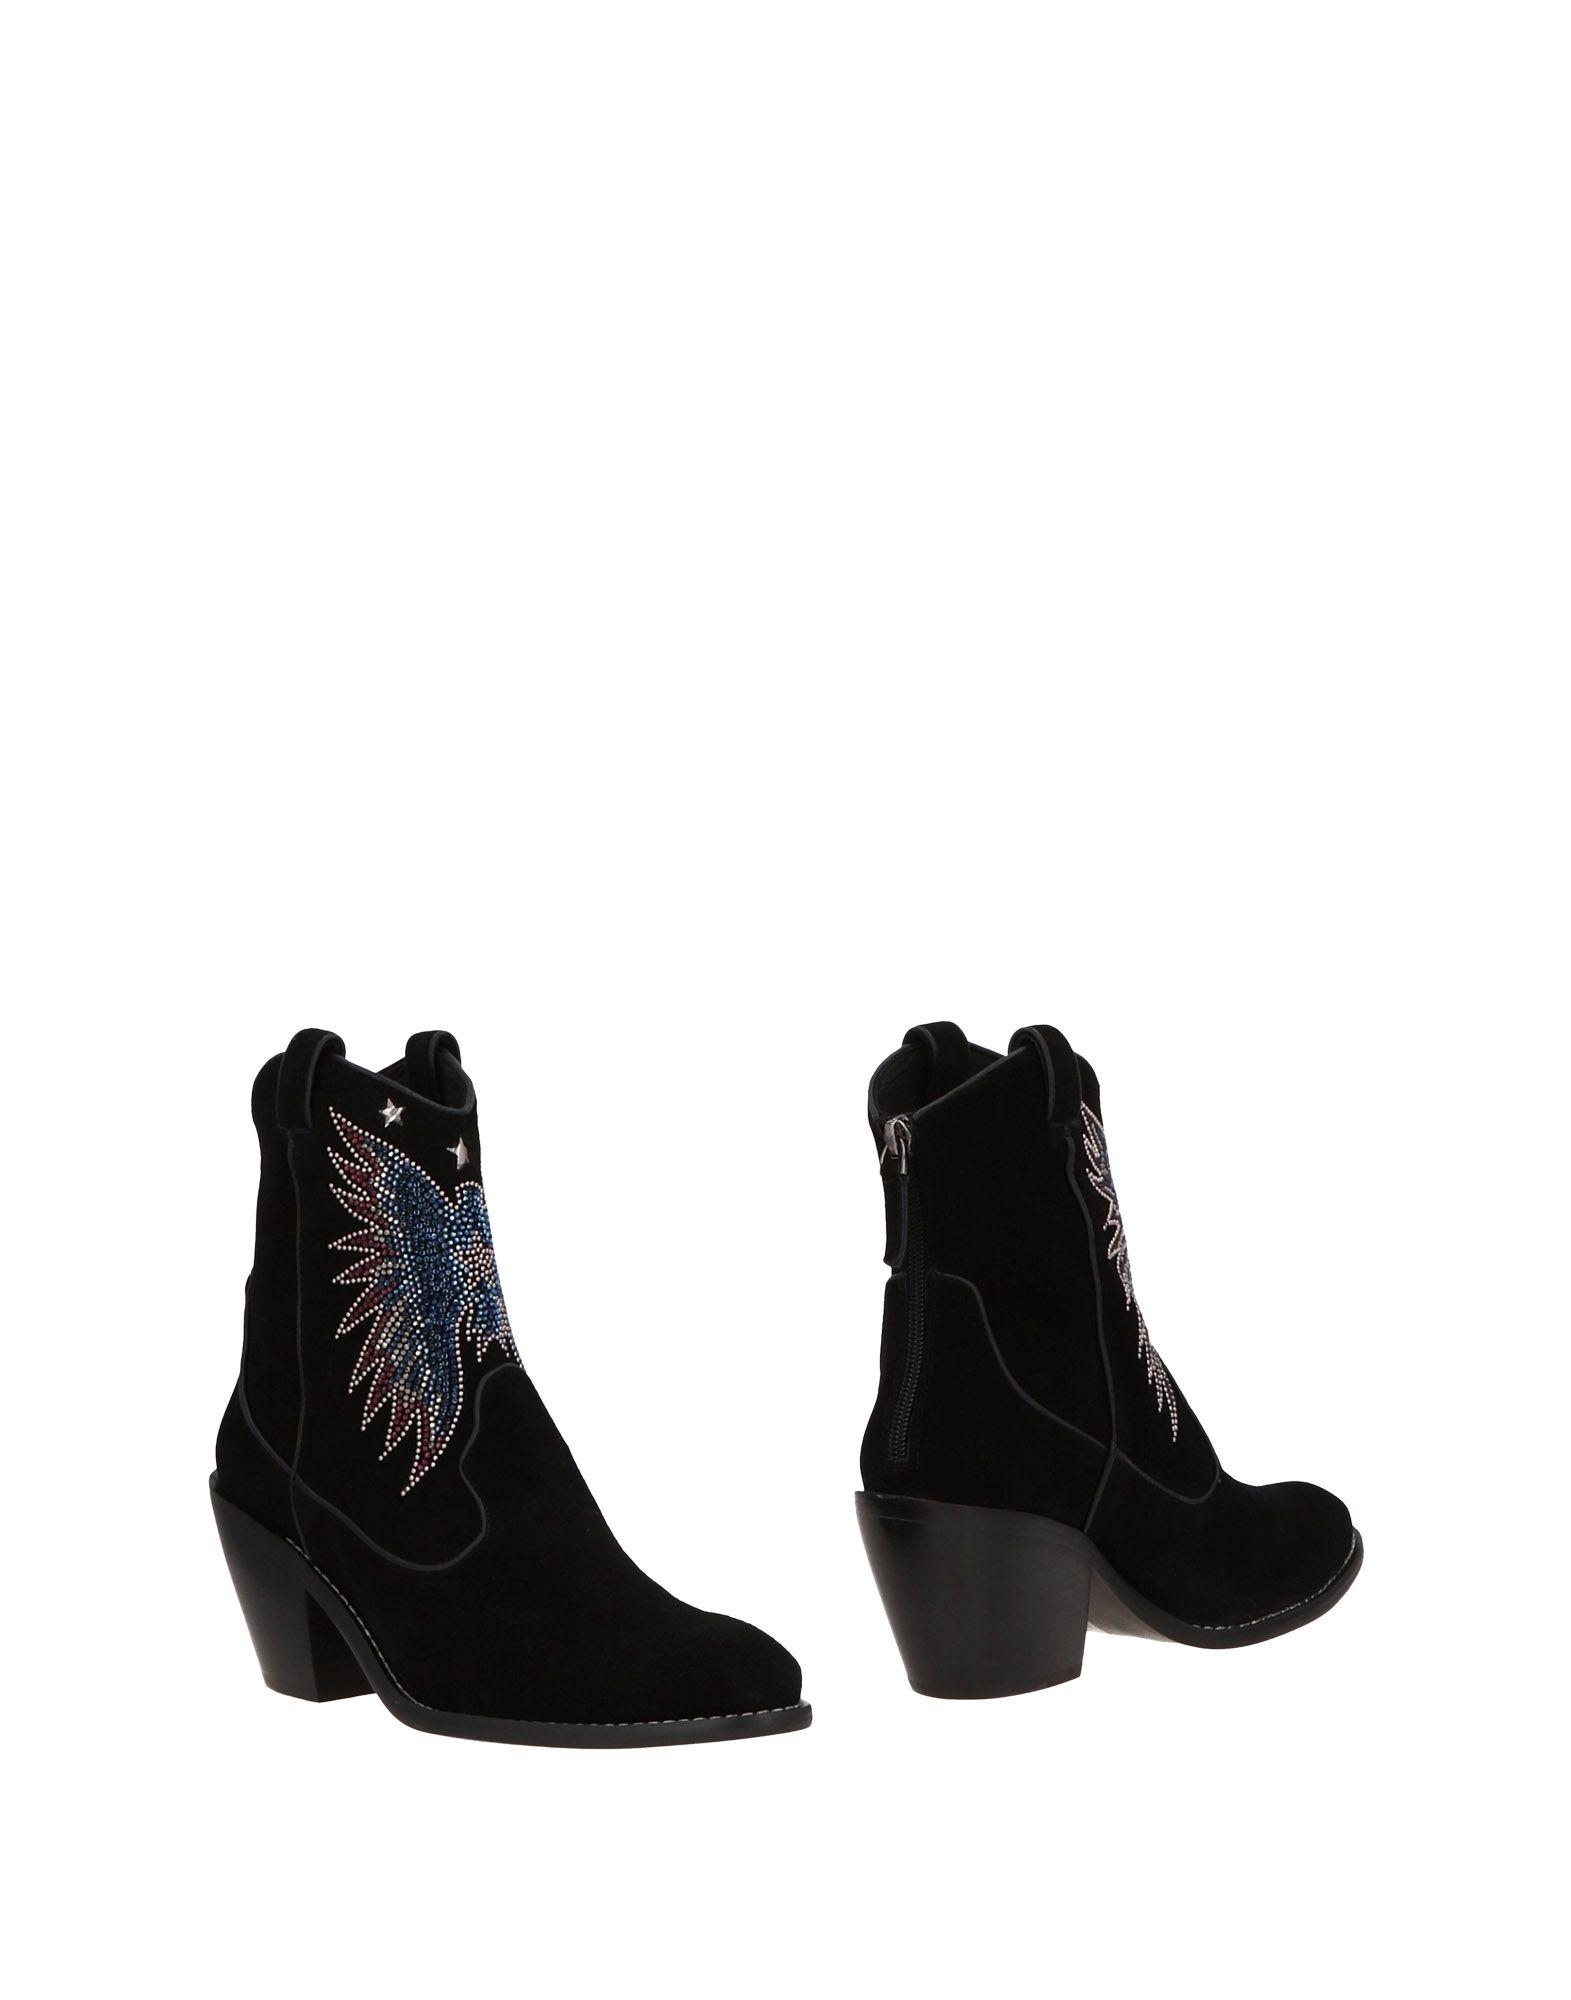 Bottine Lola Cruz Femme - Bottines Lola Cruz Noir Chaussures femme pas cher homme et femme